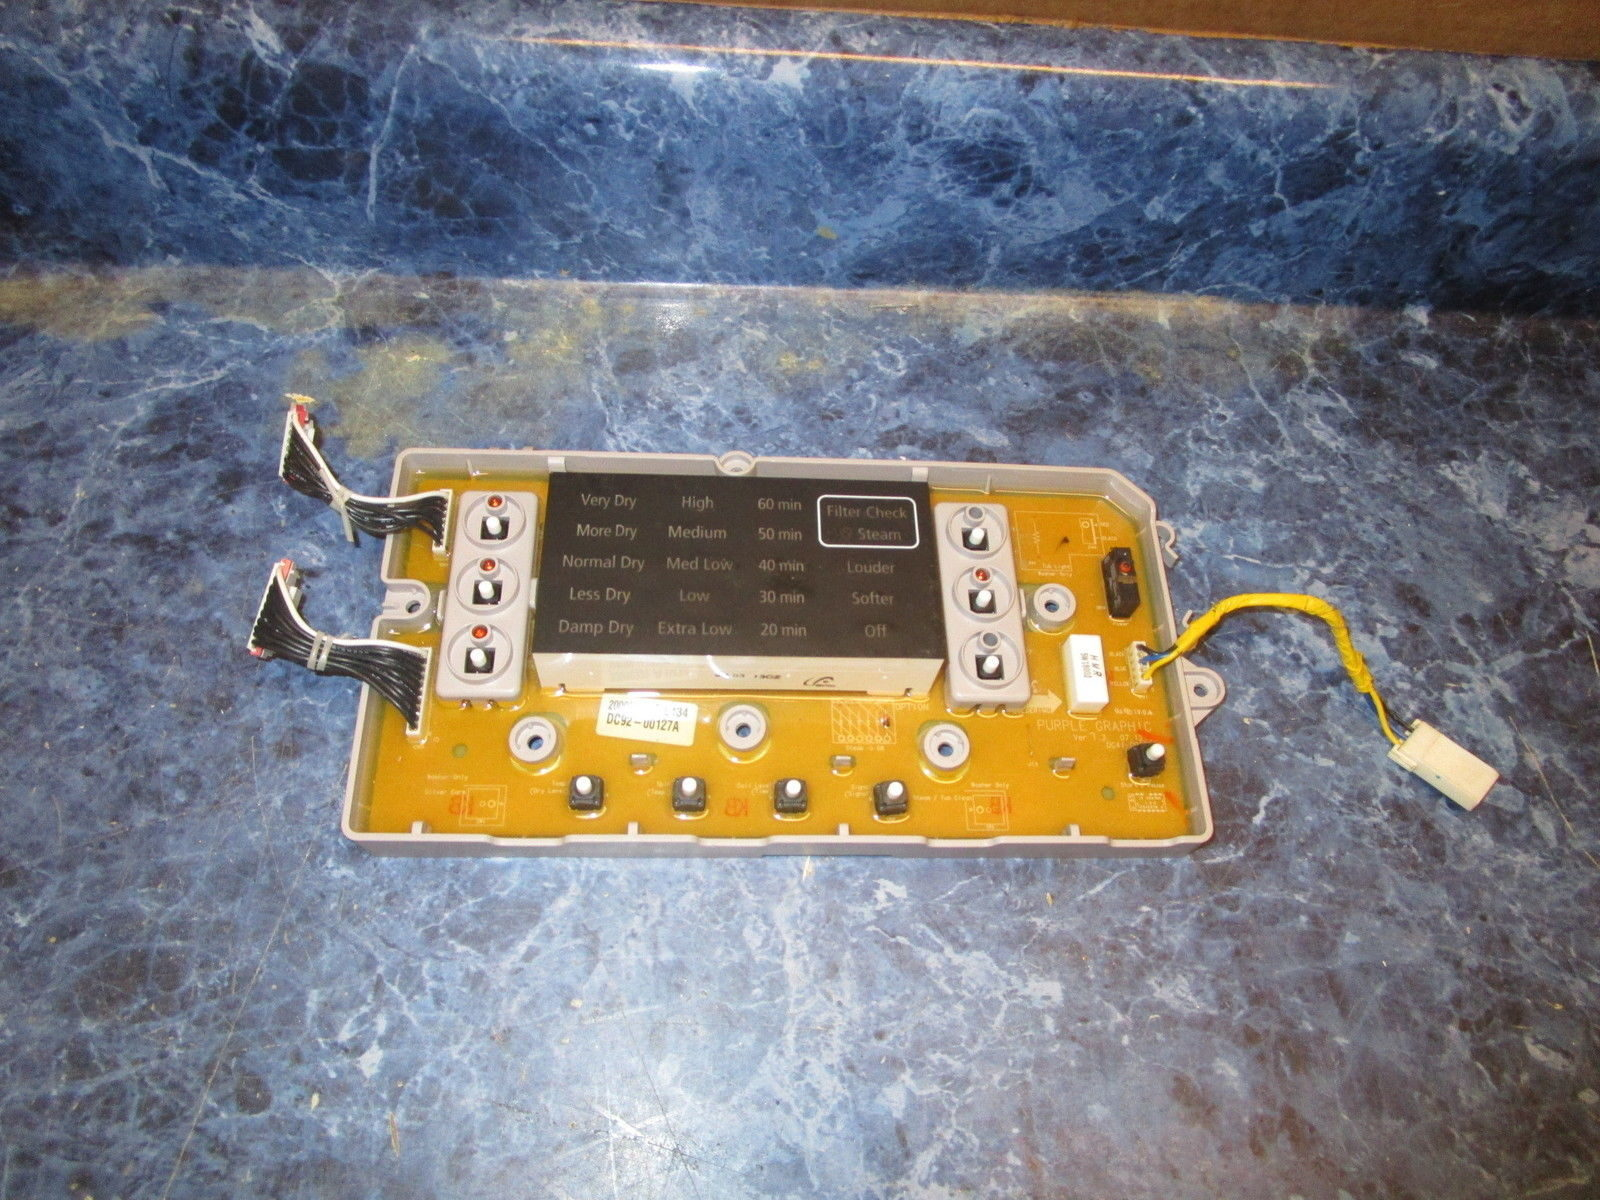 DC9200127A Archives - DIY Appliance Repair Parts